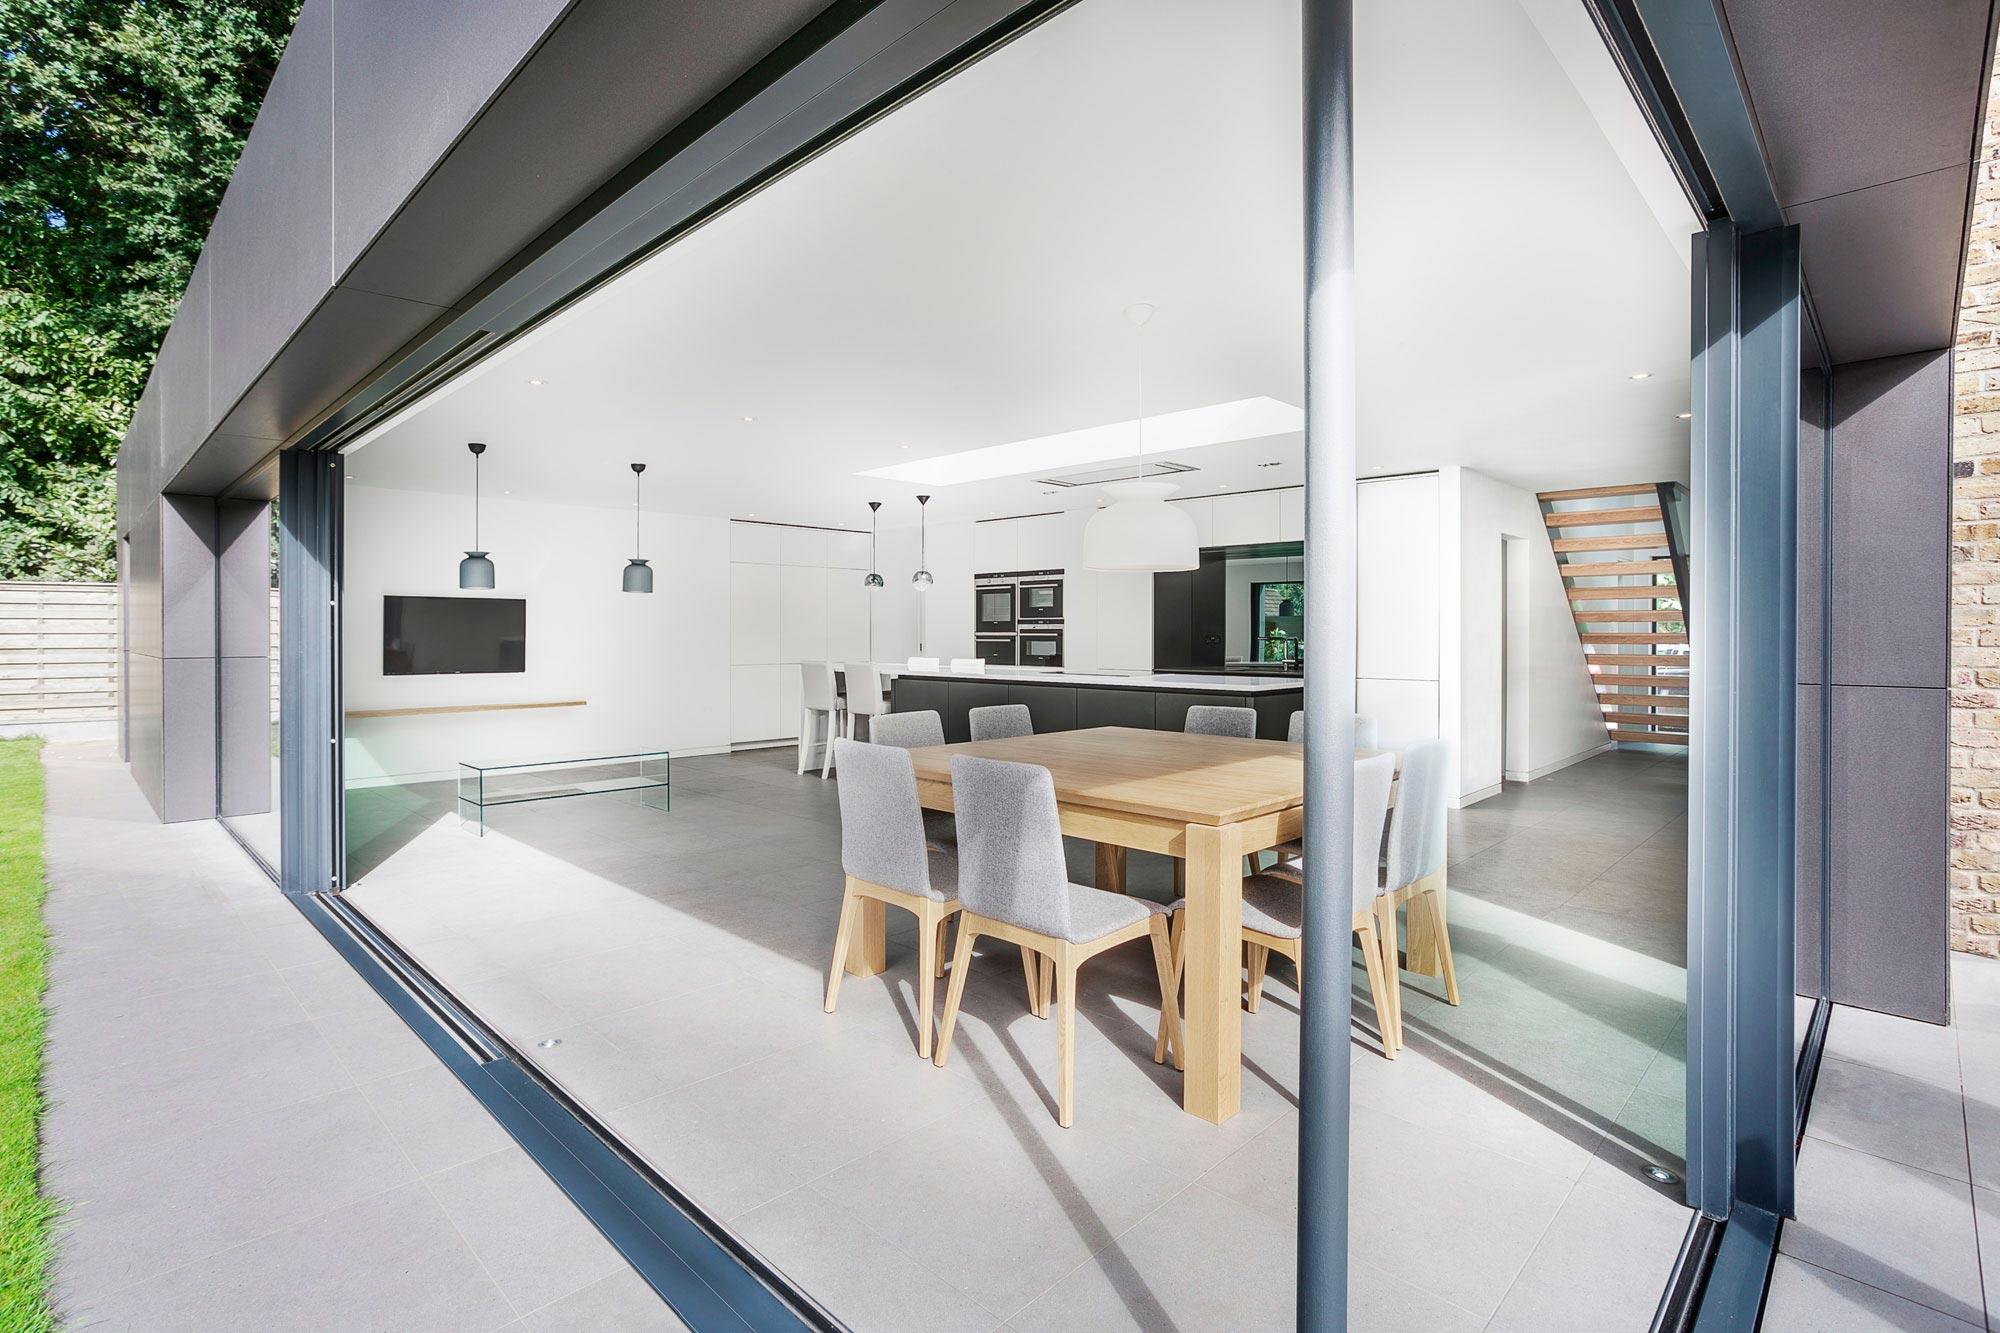 4-Bedroom Richmond Home by AR Design Studio Architects - CAANdesign ...